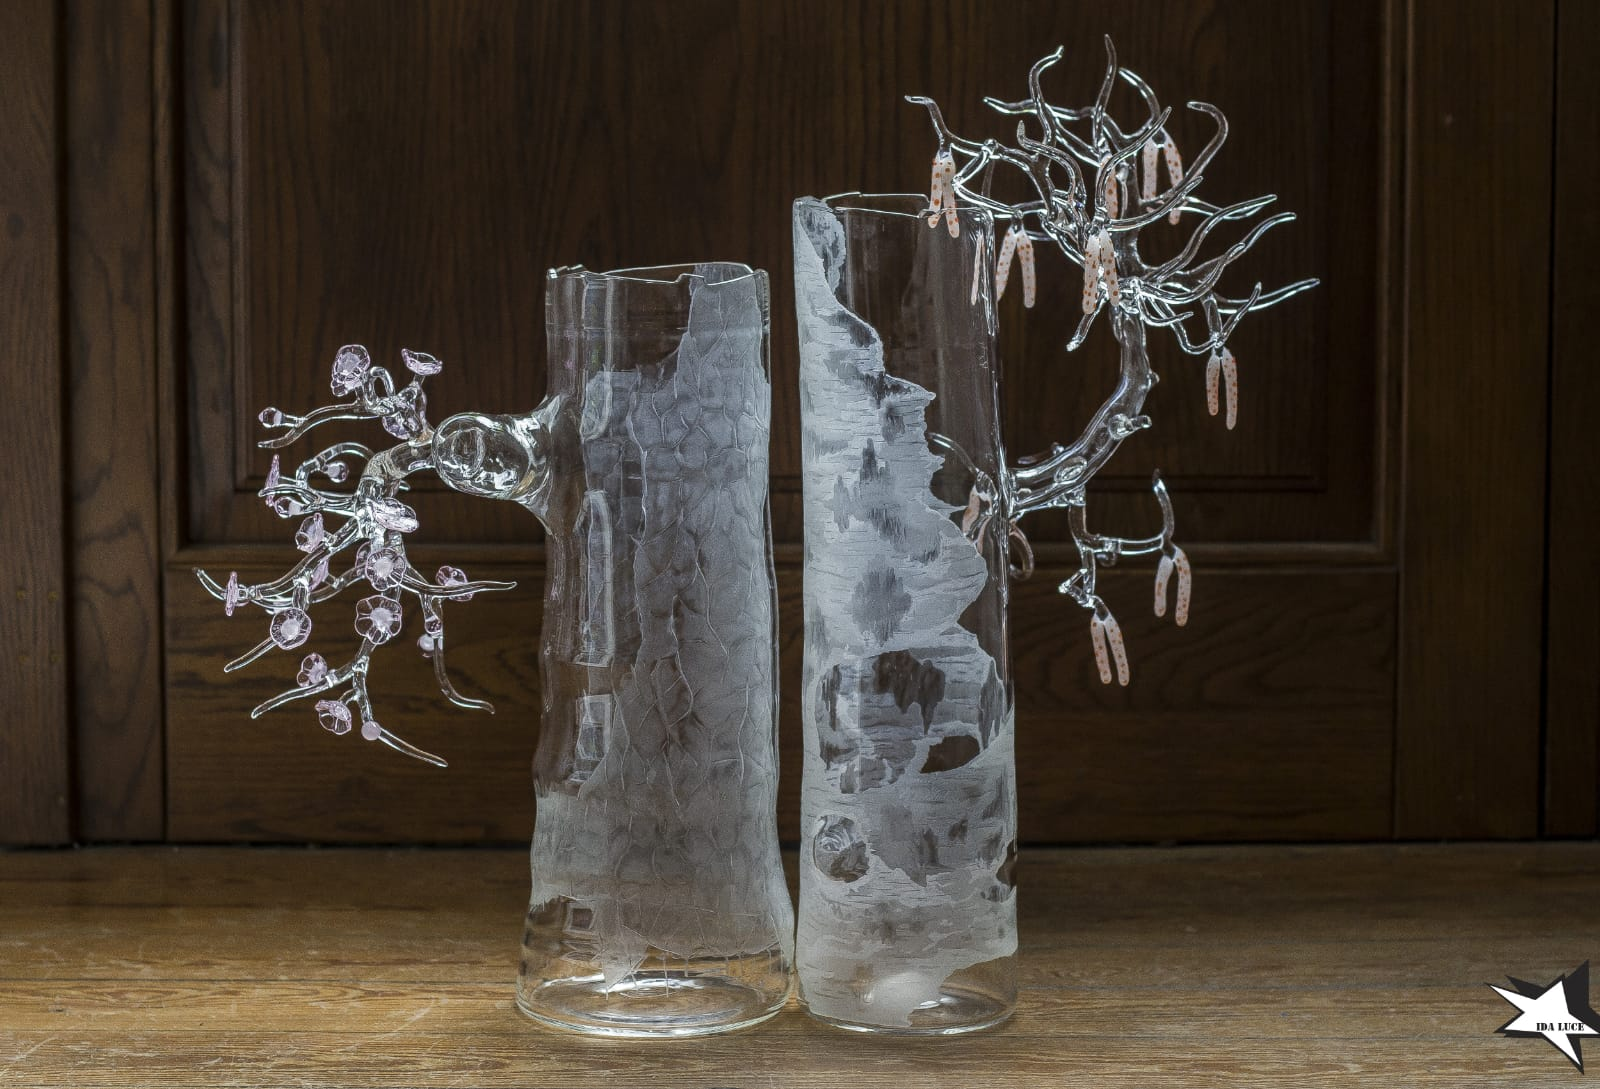 Exclusive Interview with Cavallaro – Glass Engraving Art - Simone Crestani vanessa cavallaro Exclusive Interview with Vanessa Cavallaro – Glass Engraving Art Exclusive Interview with Cavallaro     Glass Engraving Art Simone Crestani